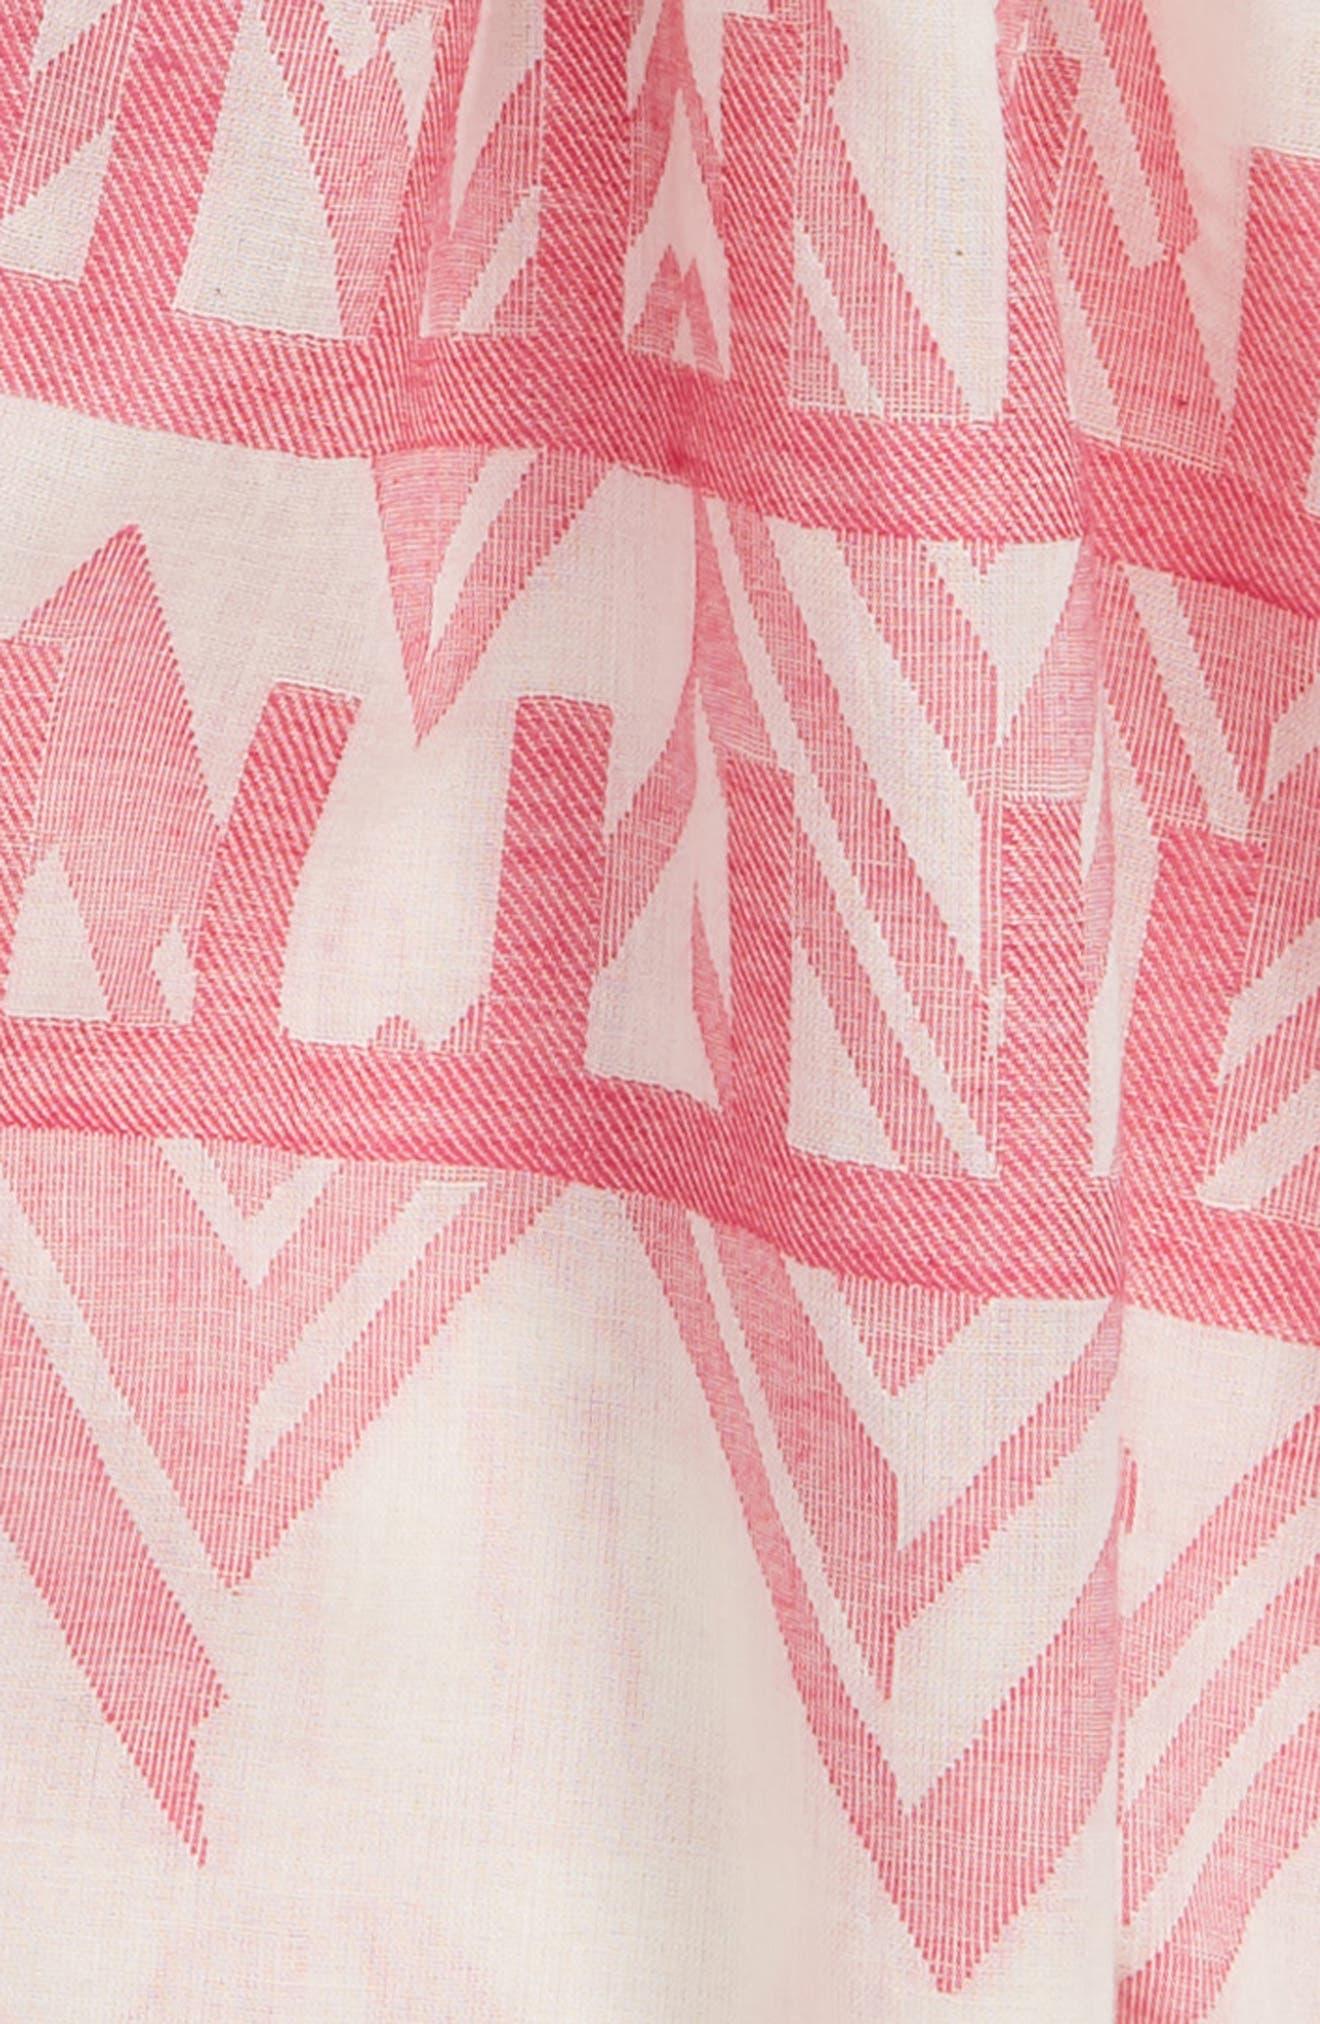 Jacquard Print Cotton Scarf,                             Alternate thumbnail 3, color,                             900